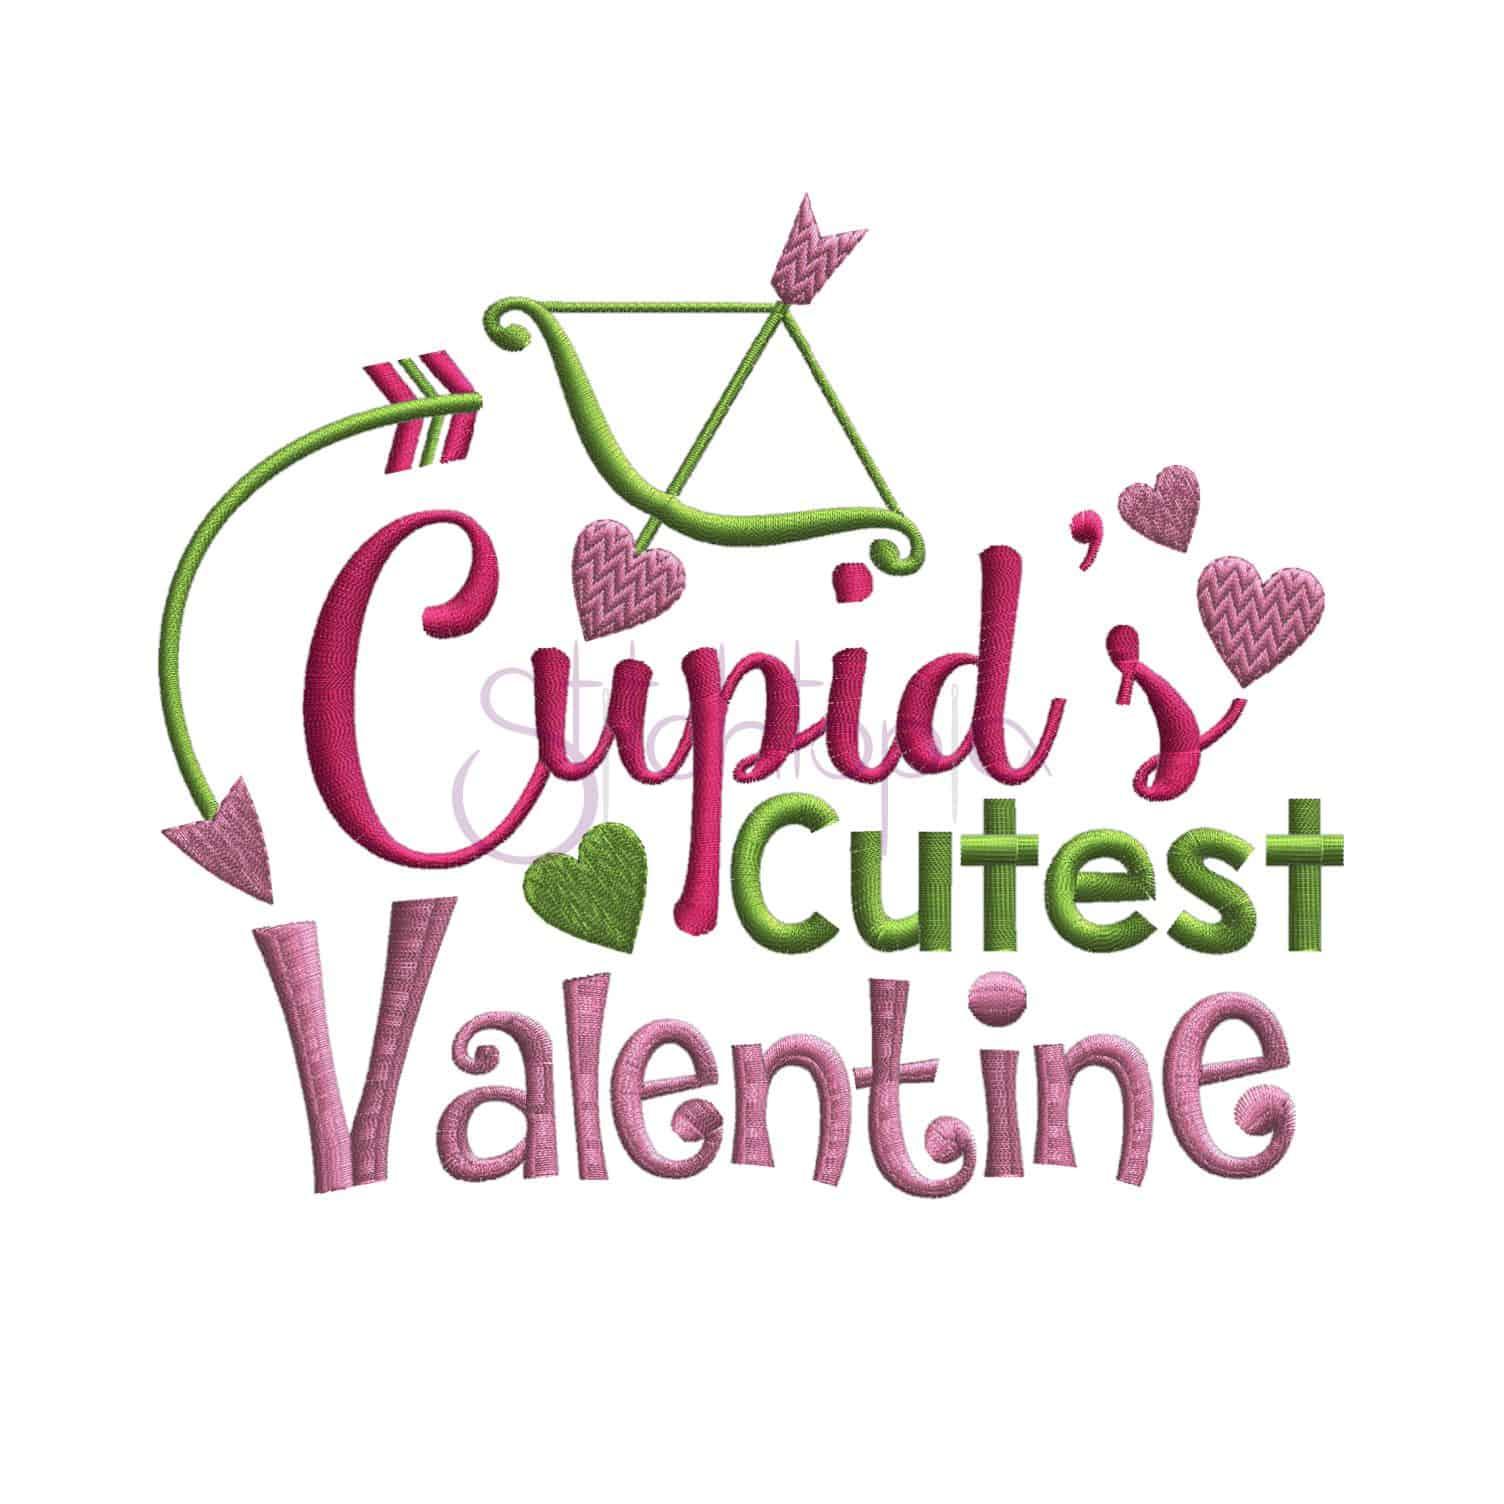 Cupid s cutest valentine embroidery design stitchtopia